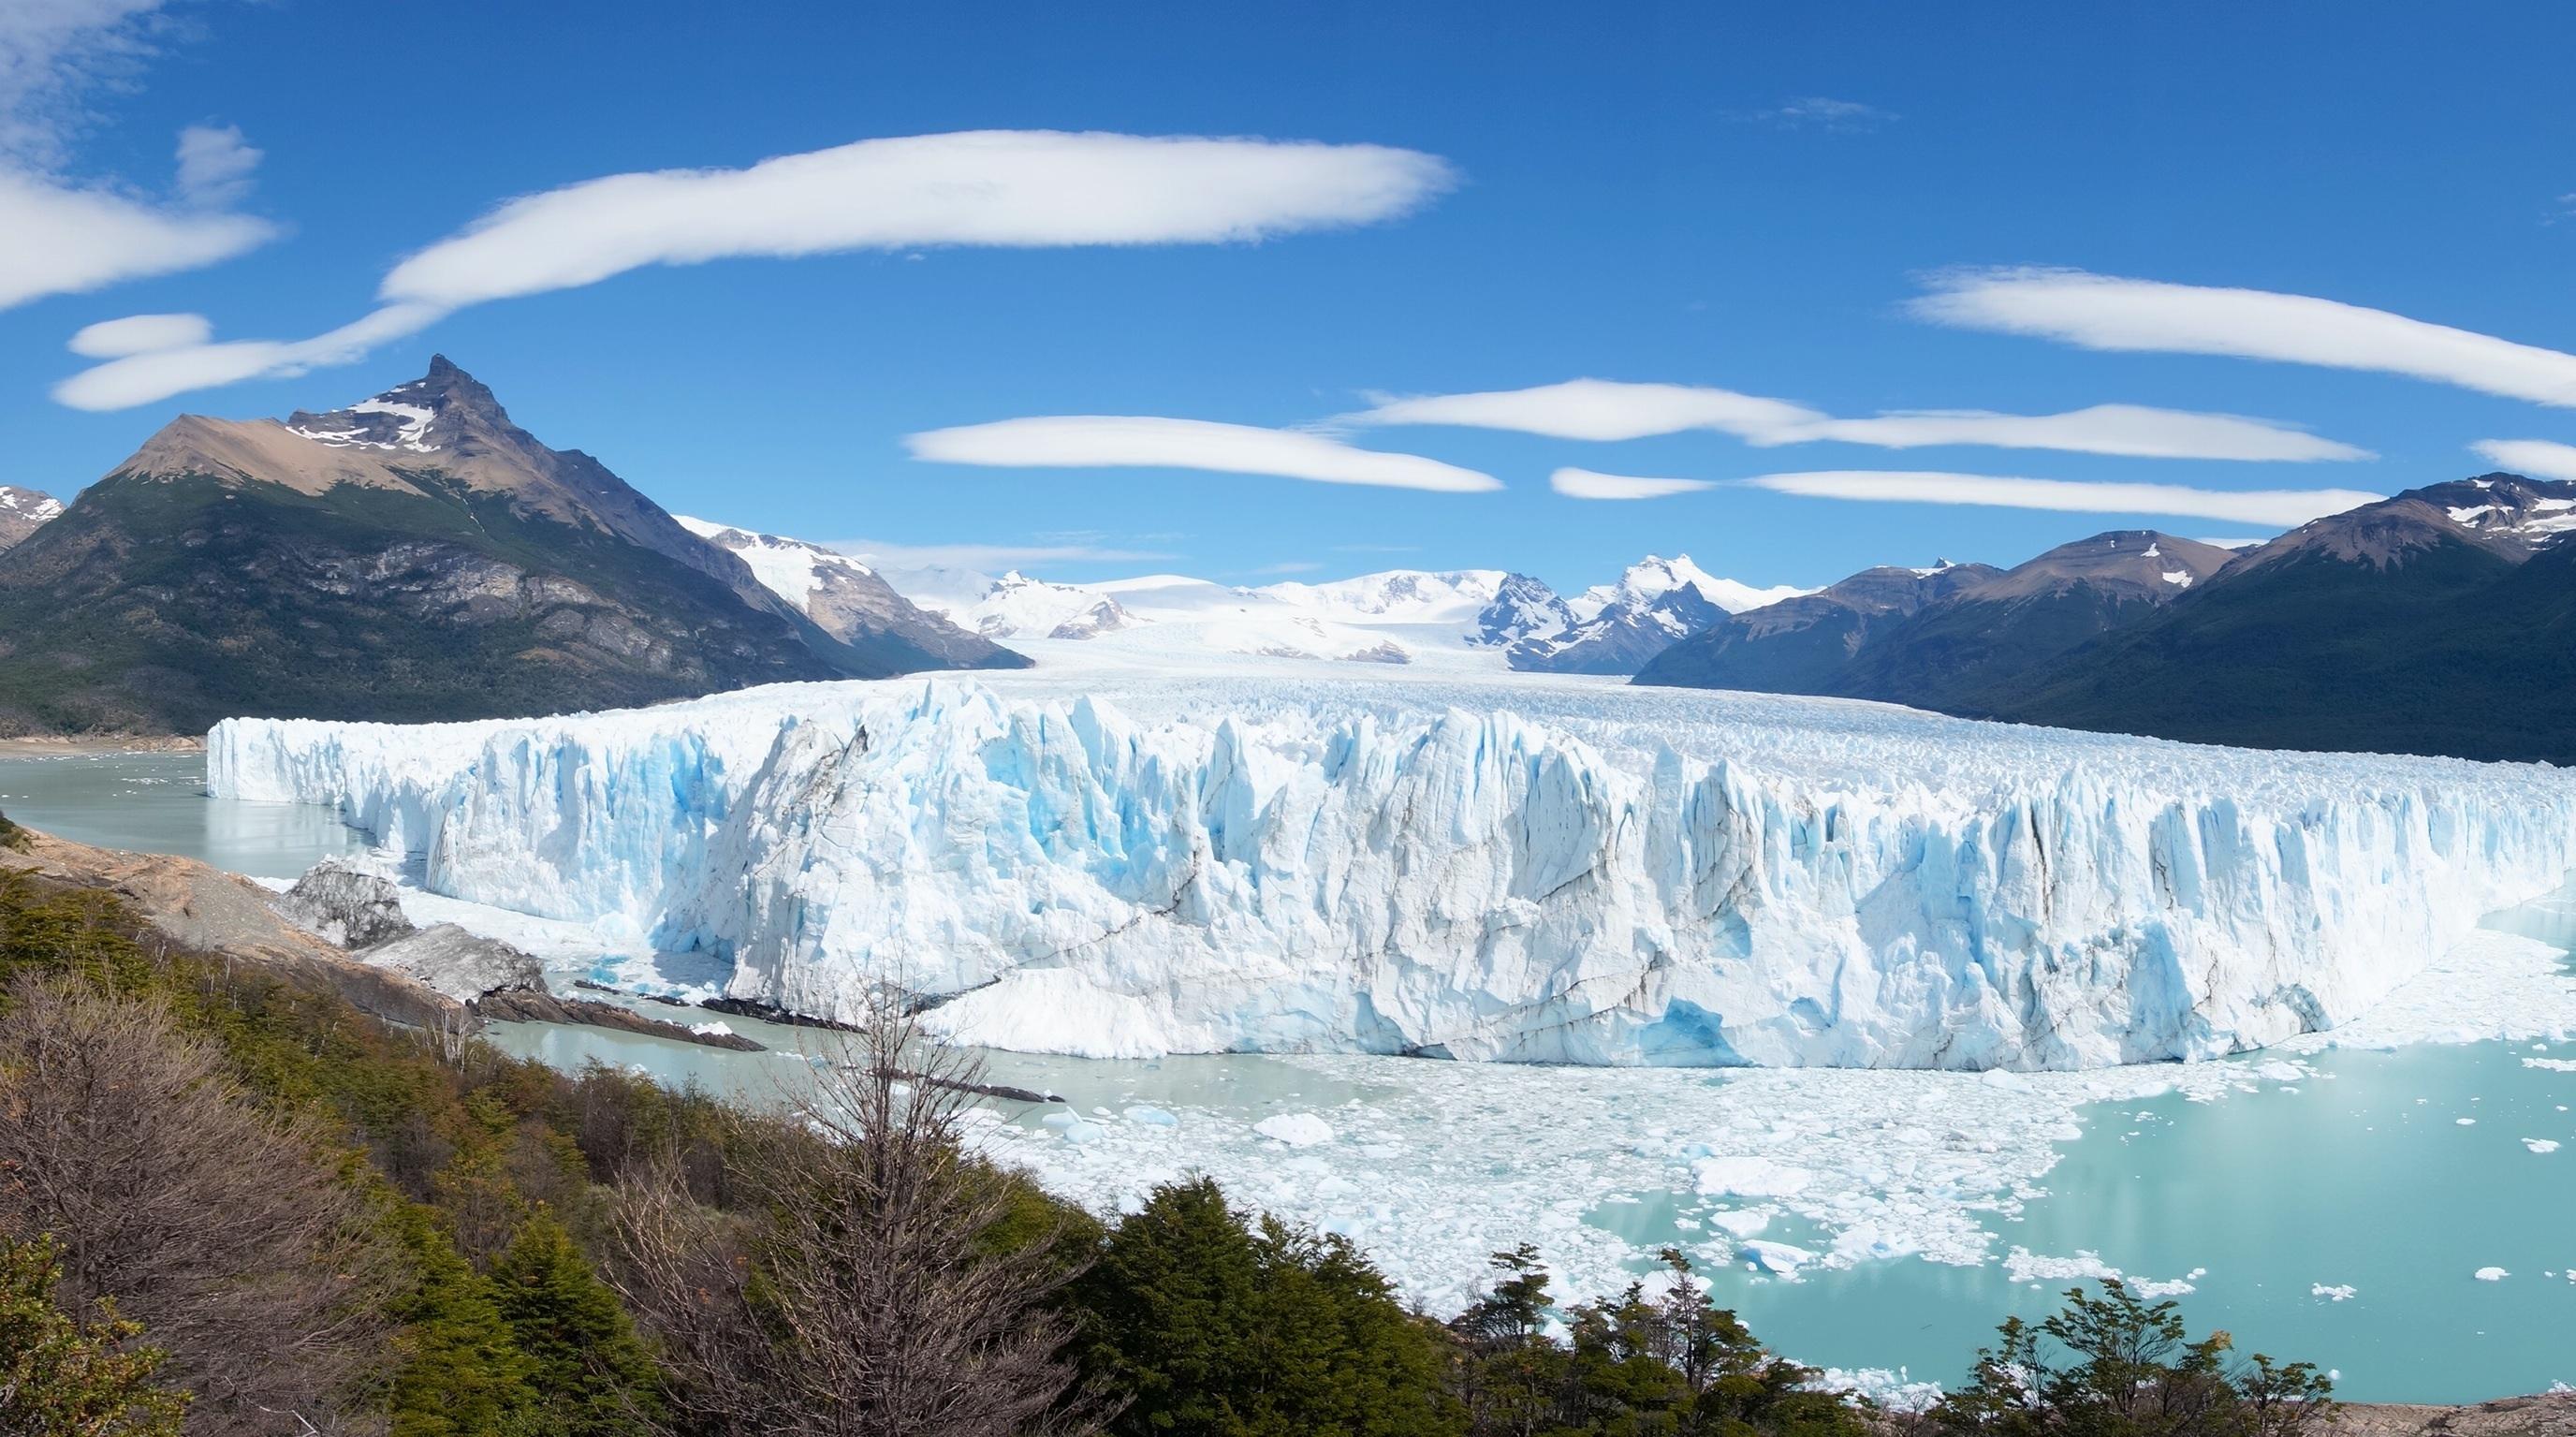 Nacional: Visiting The Perito Moreno Glaciar